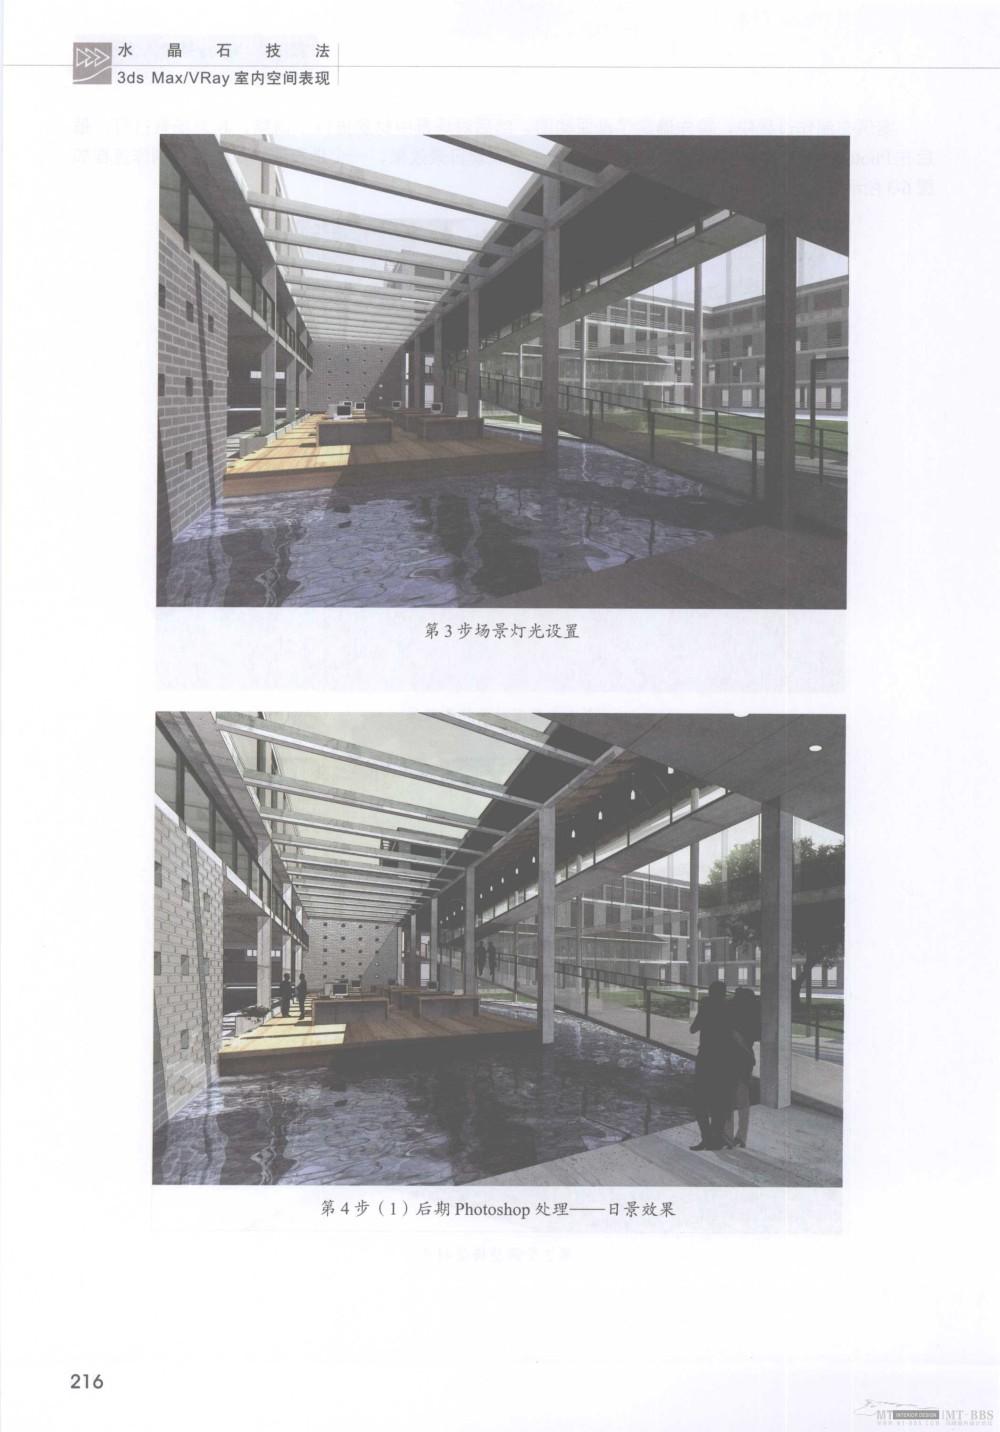 水晶石技法-3ds_Max&VRay室内空间表现_水晶石技法-3ds_Max&VRay室内空间表现_页面_222.jpg